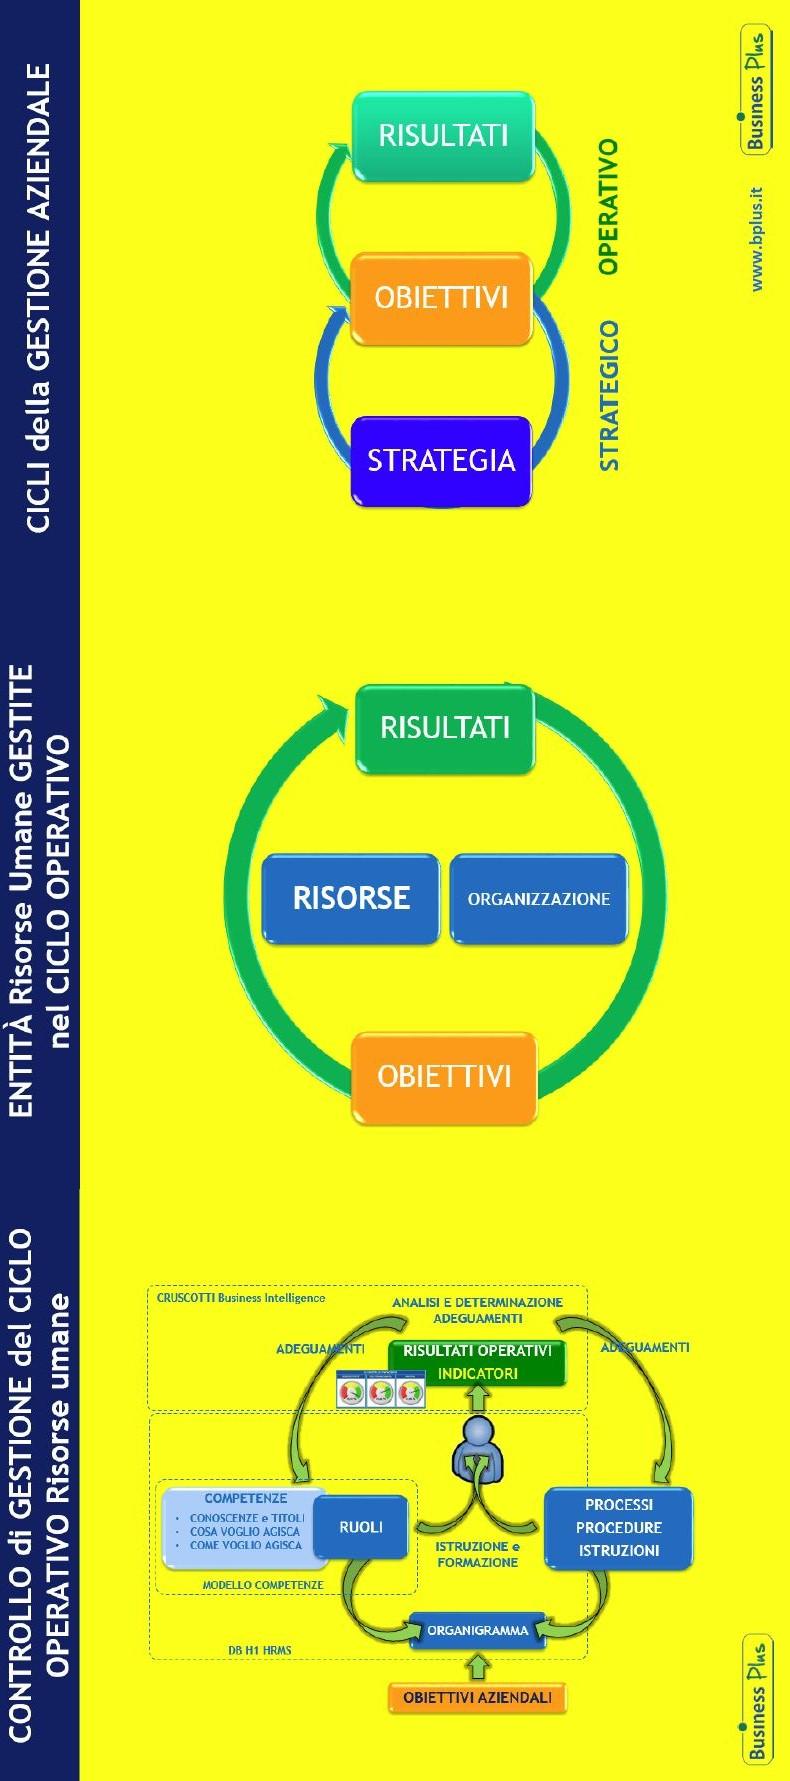 Controllo di Gestione RU - Infografica